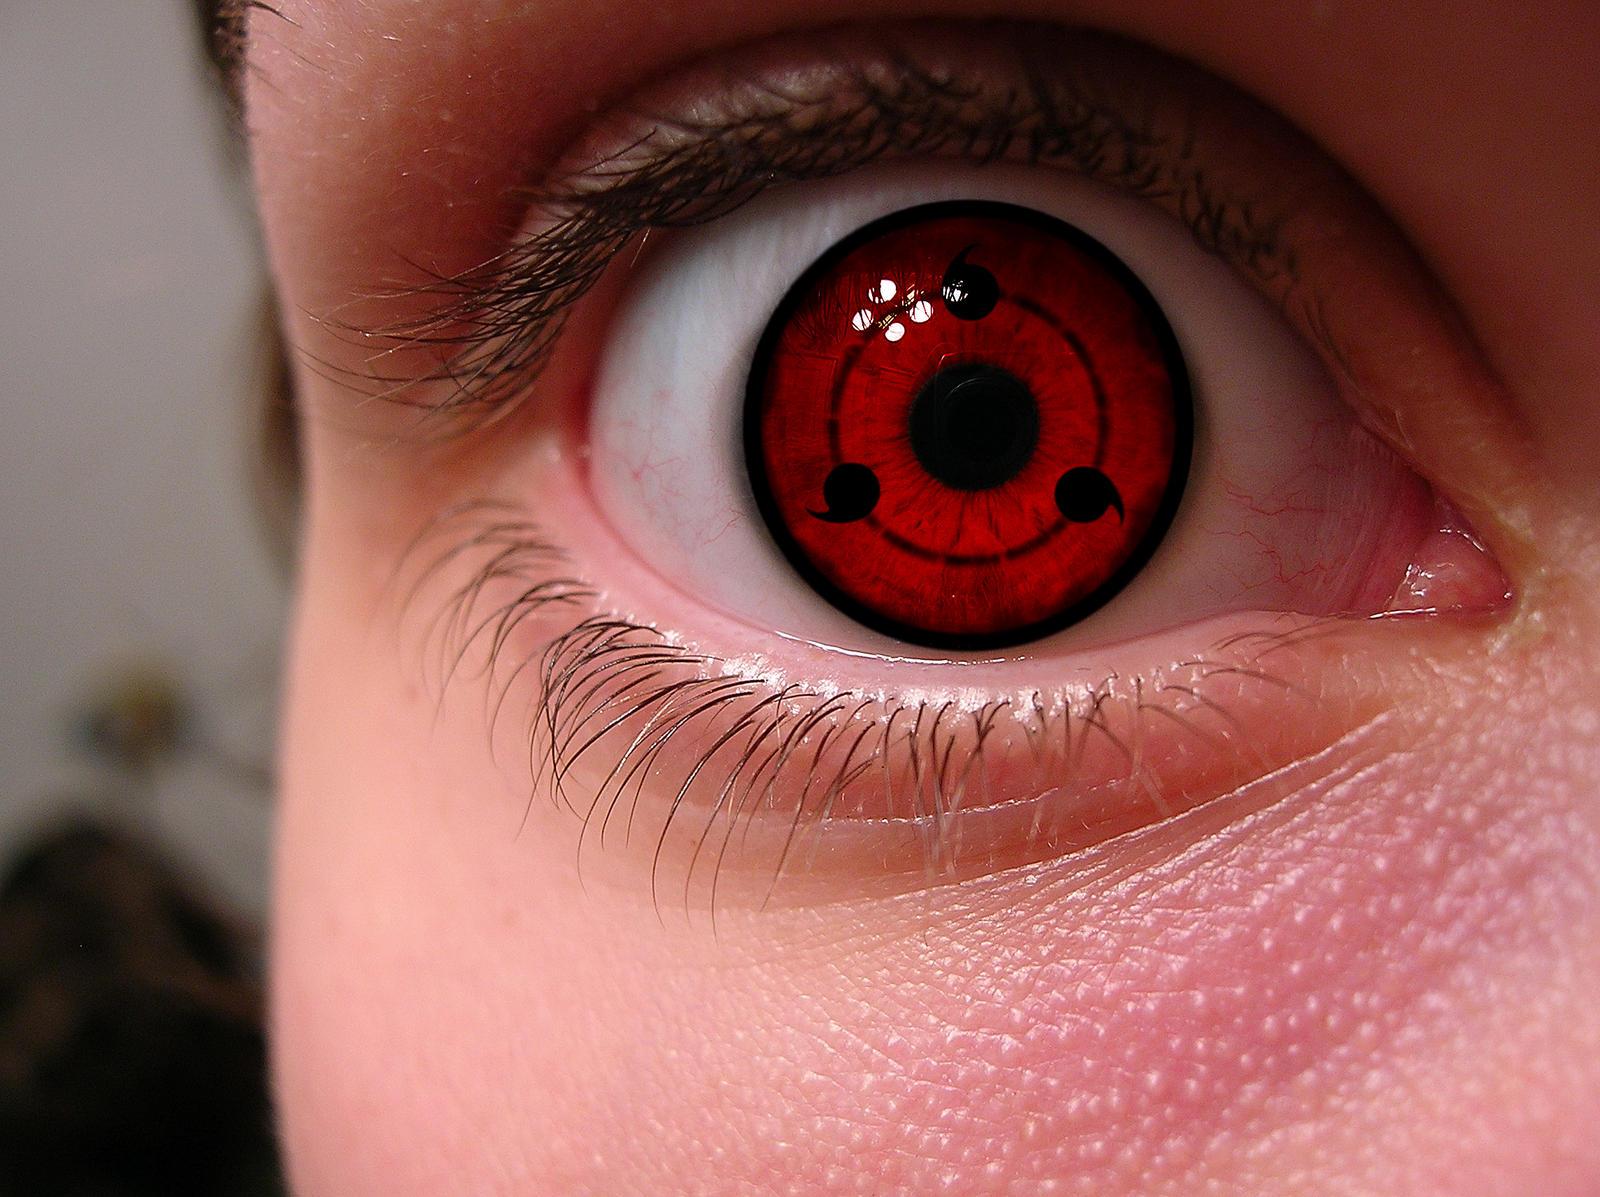 Sharingan Eye by TH3D4RKFL4M3 on DeviantArt